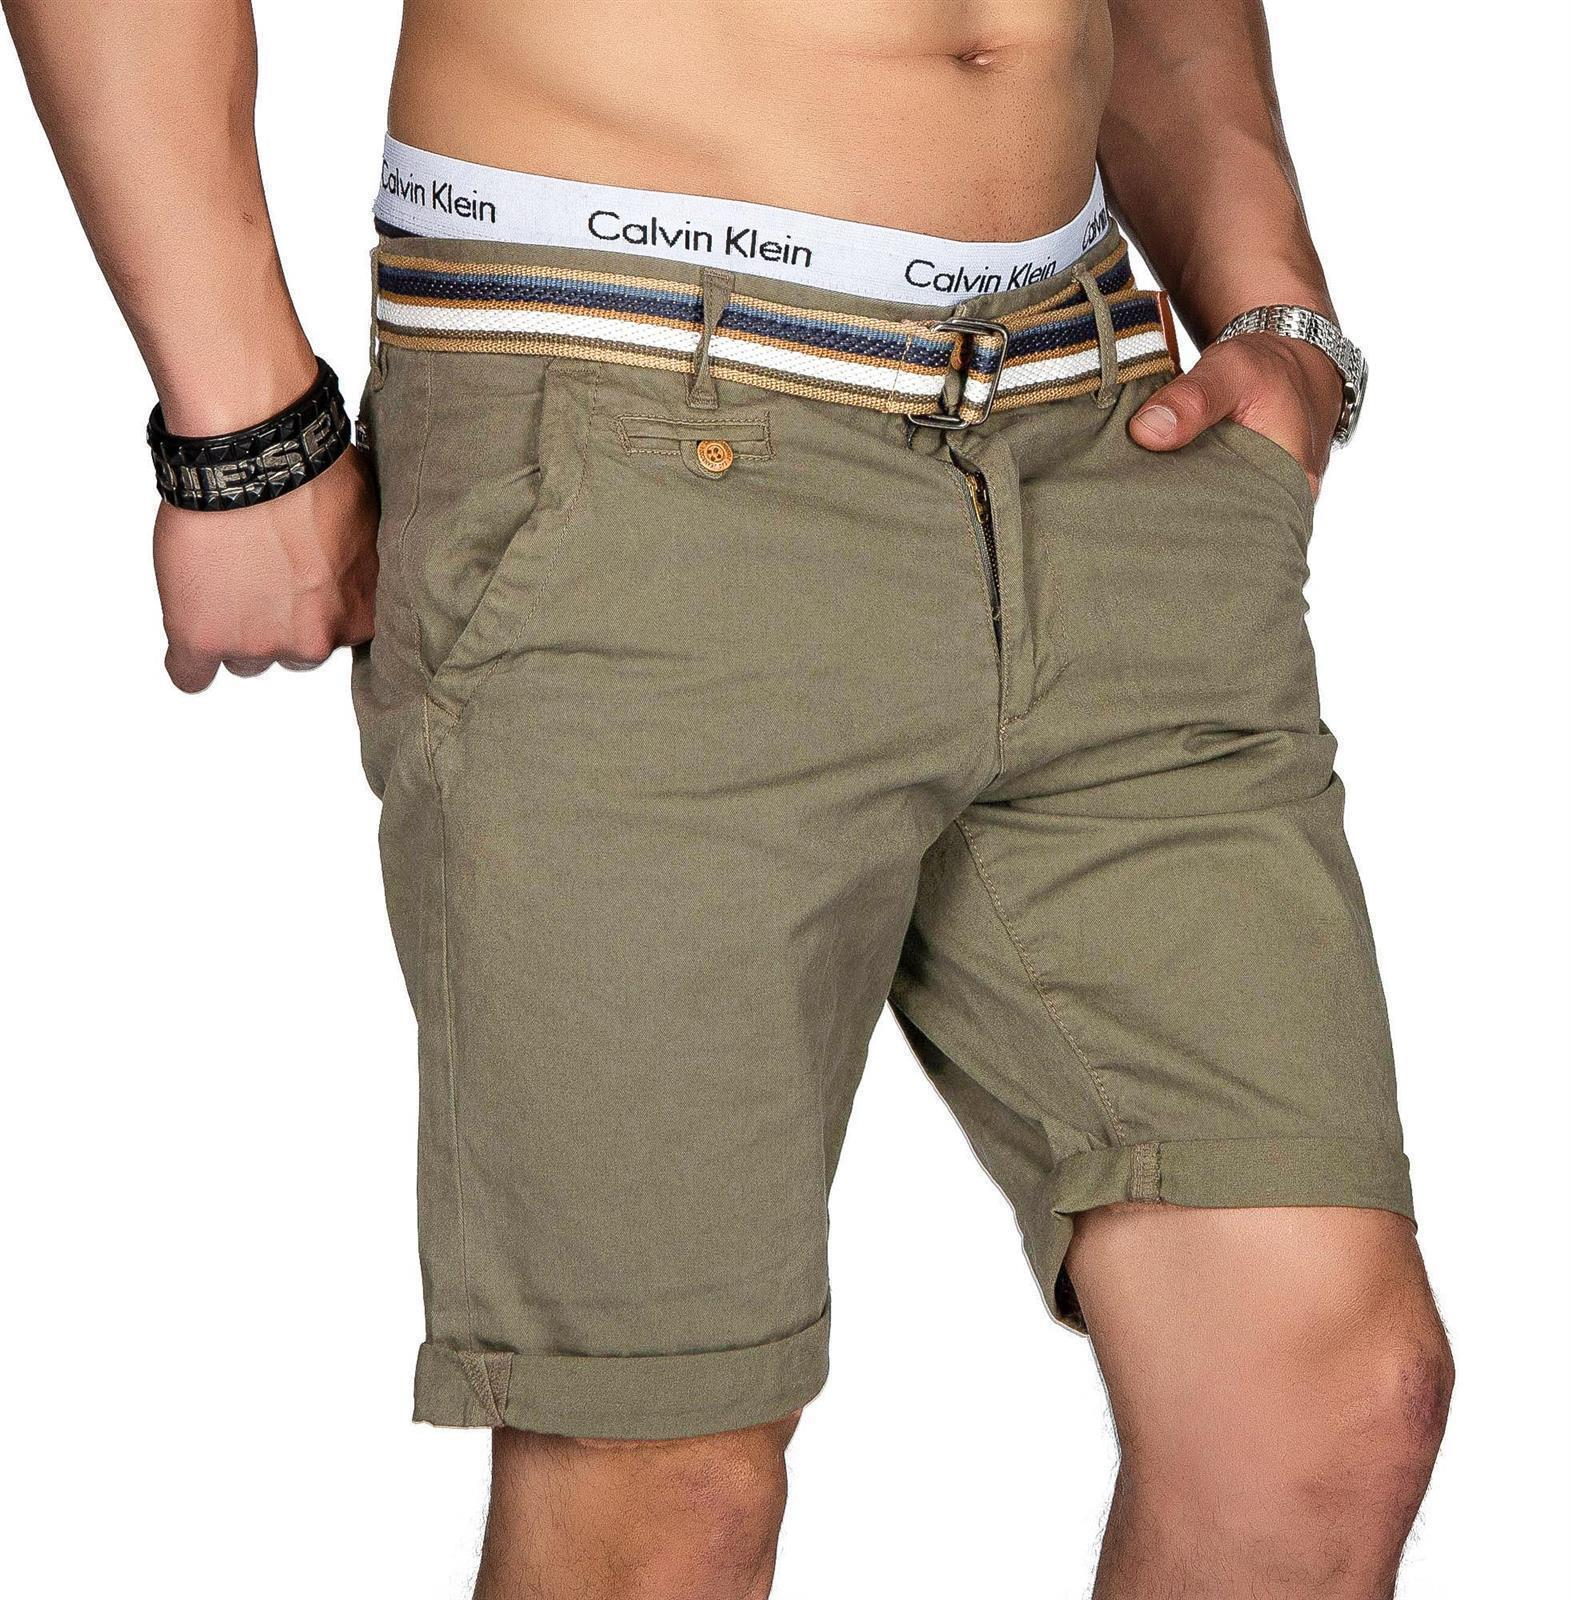 Indicode-Herren-Sommer-Bermuda-Chino-Shorts-kurze-Hose-Sommerhose-Short-NEU-B499 Indexbild 35